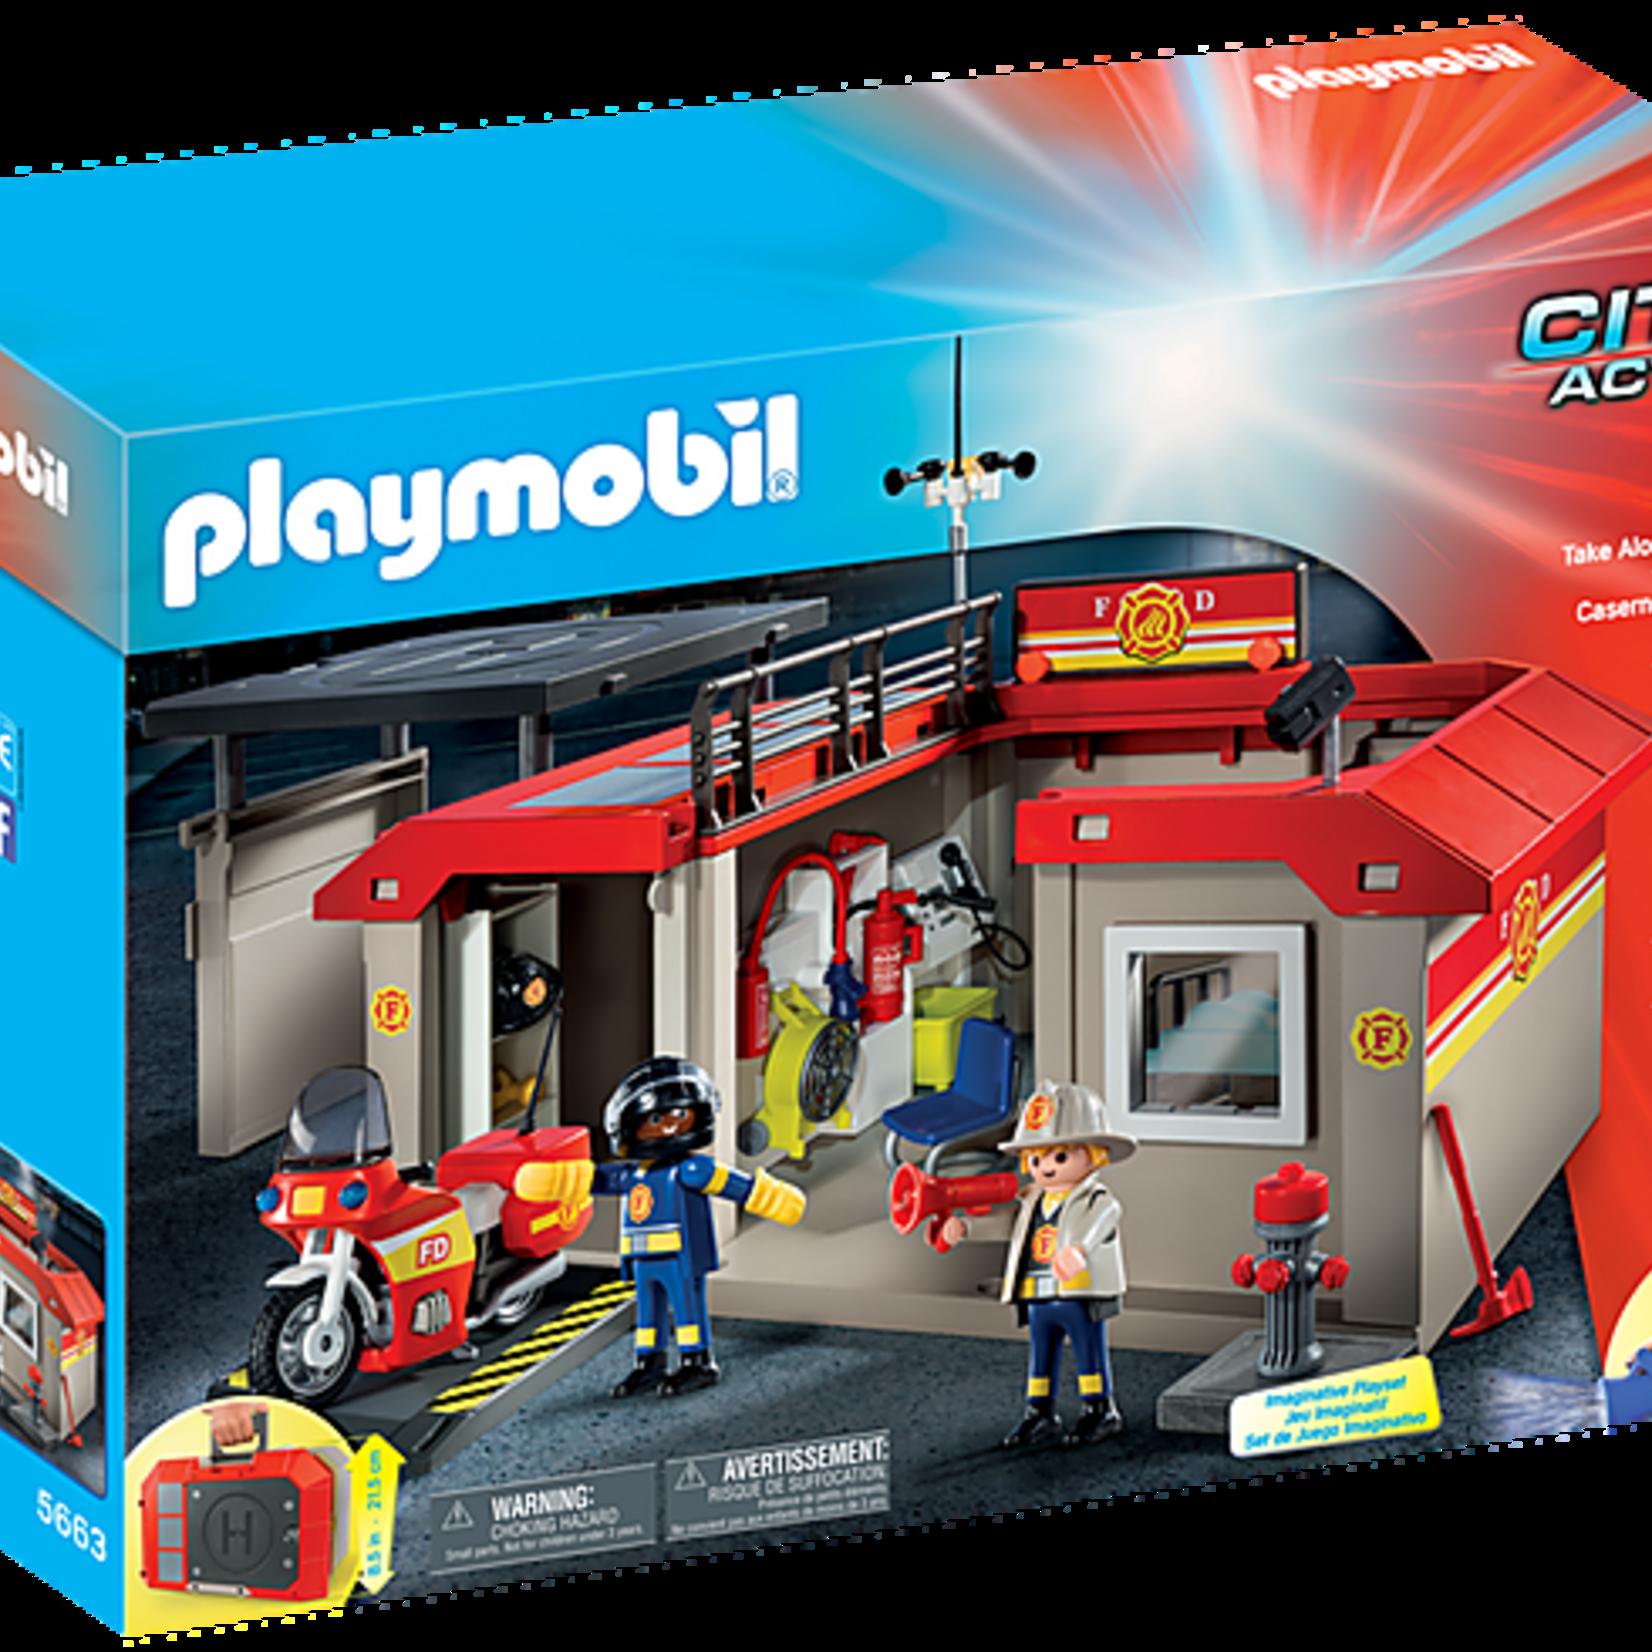 Playmobil Take Along Fire Station - Playmobil 5663